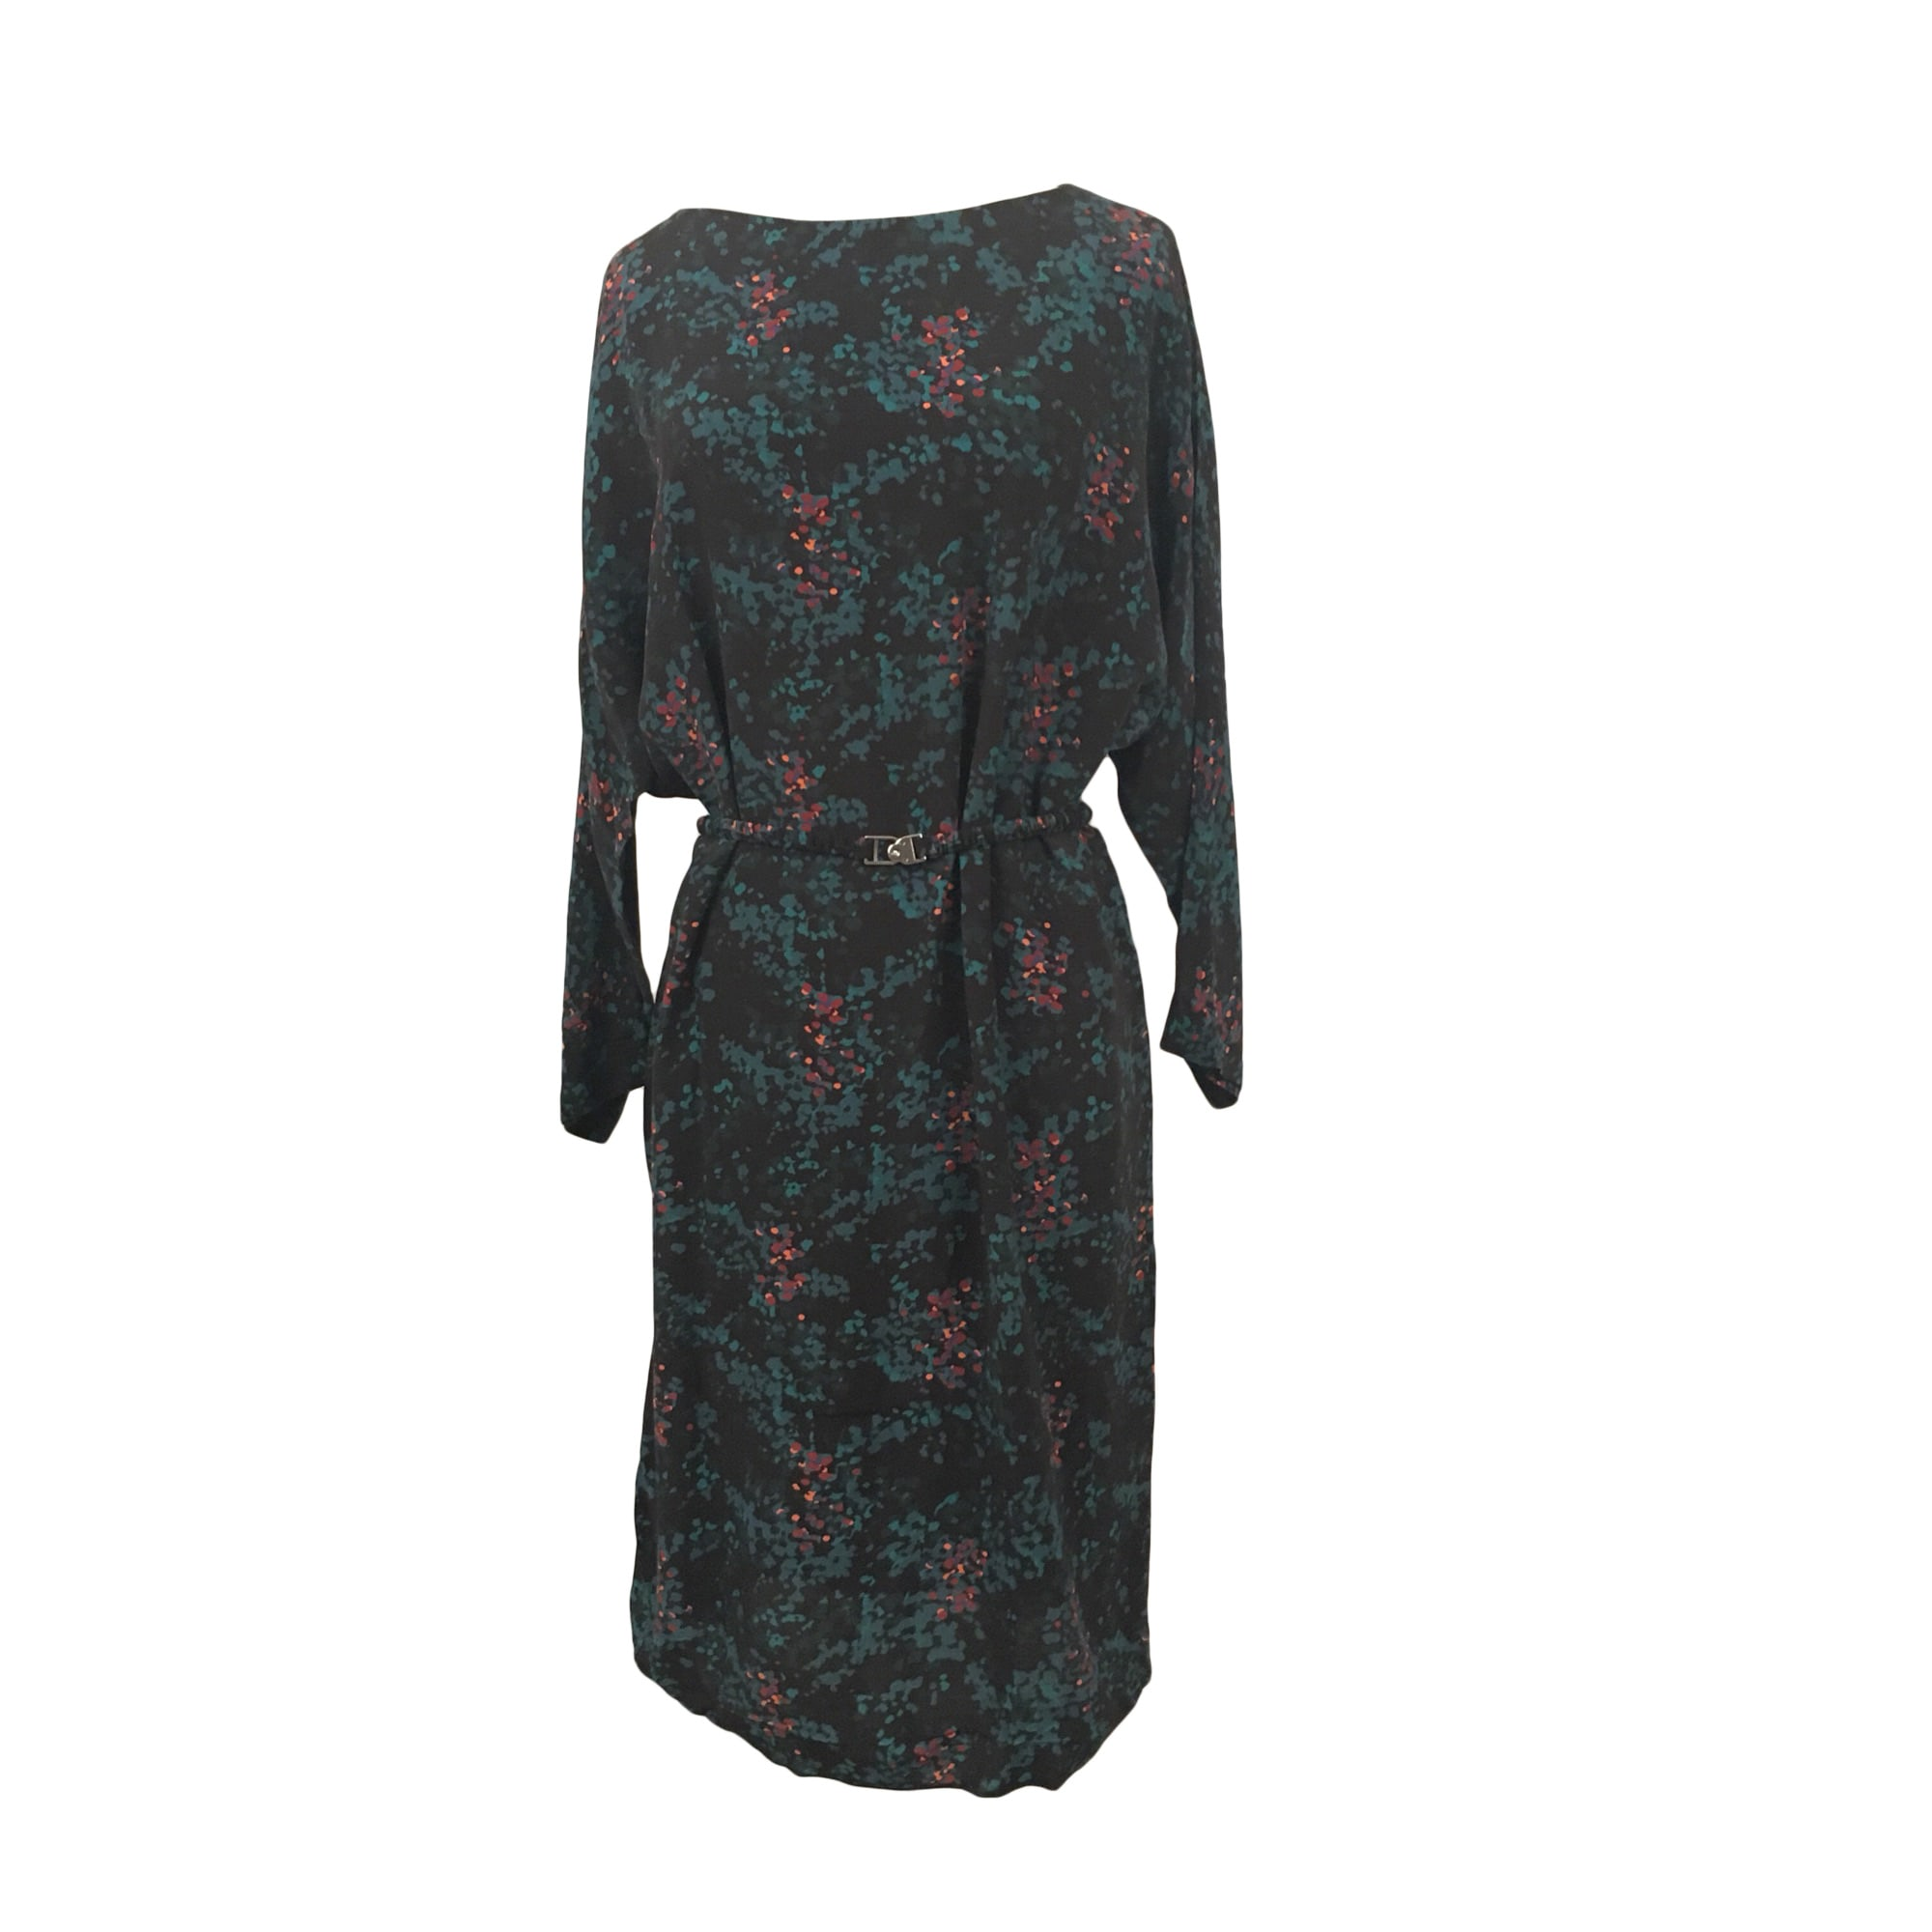 Midi Dress TARA JARMON Blue, navy, turquoise